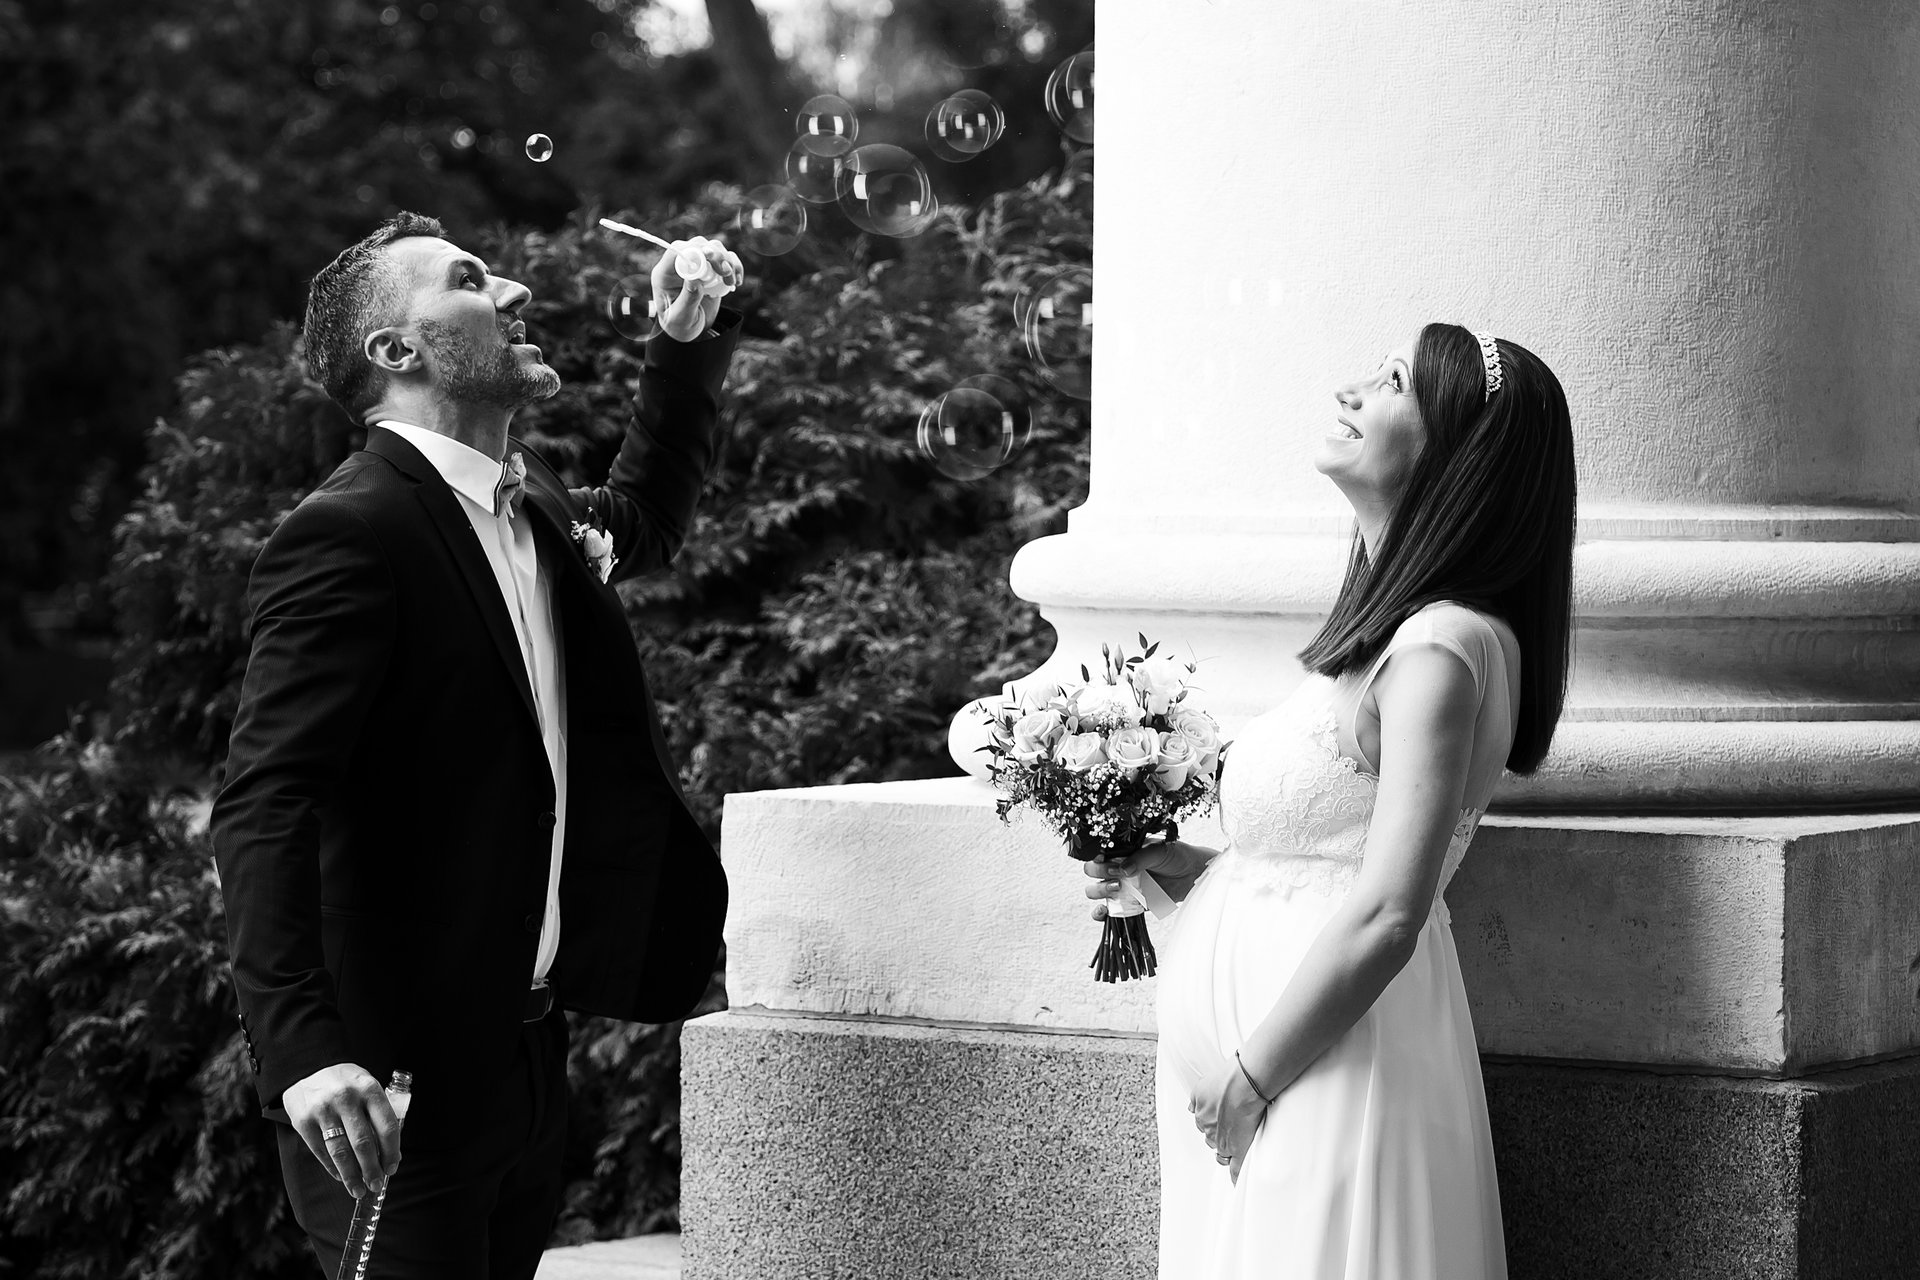 Най-щастливият ден | Author Lyudmil Dimitrov - LDimitrov | PHOTO FORUM